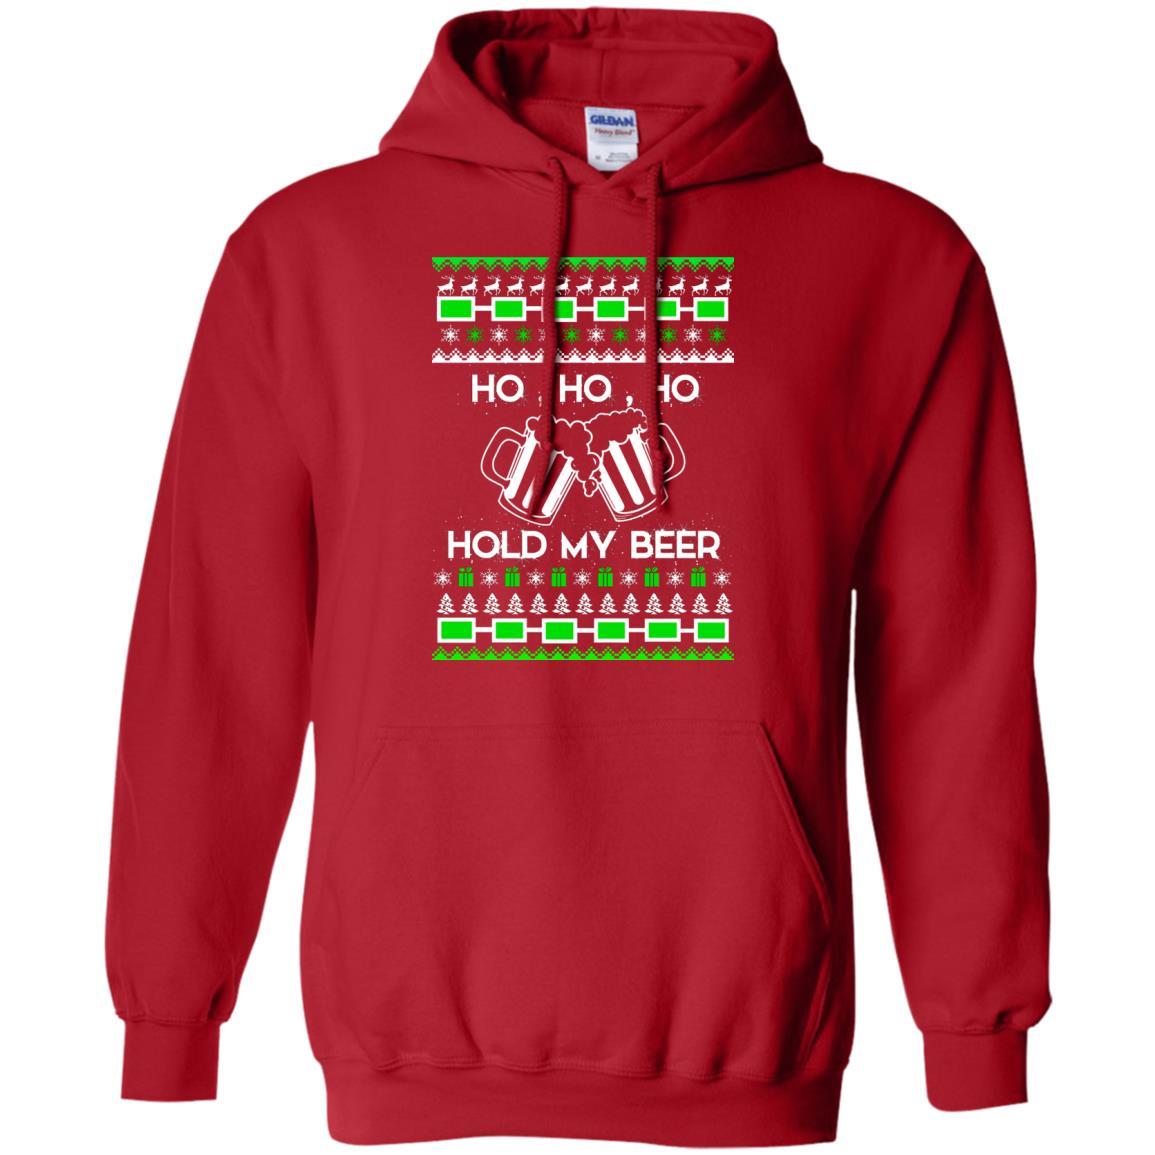 Ho Ho Ho Hold My Beer Christmas Sweater, Hoodie - Rockatee